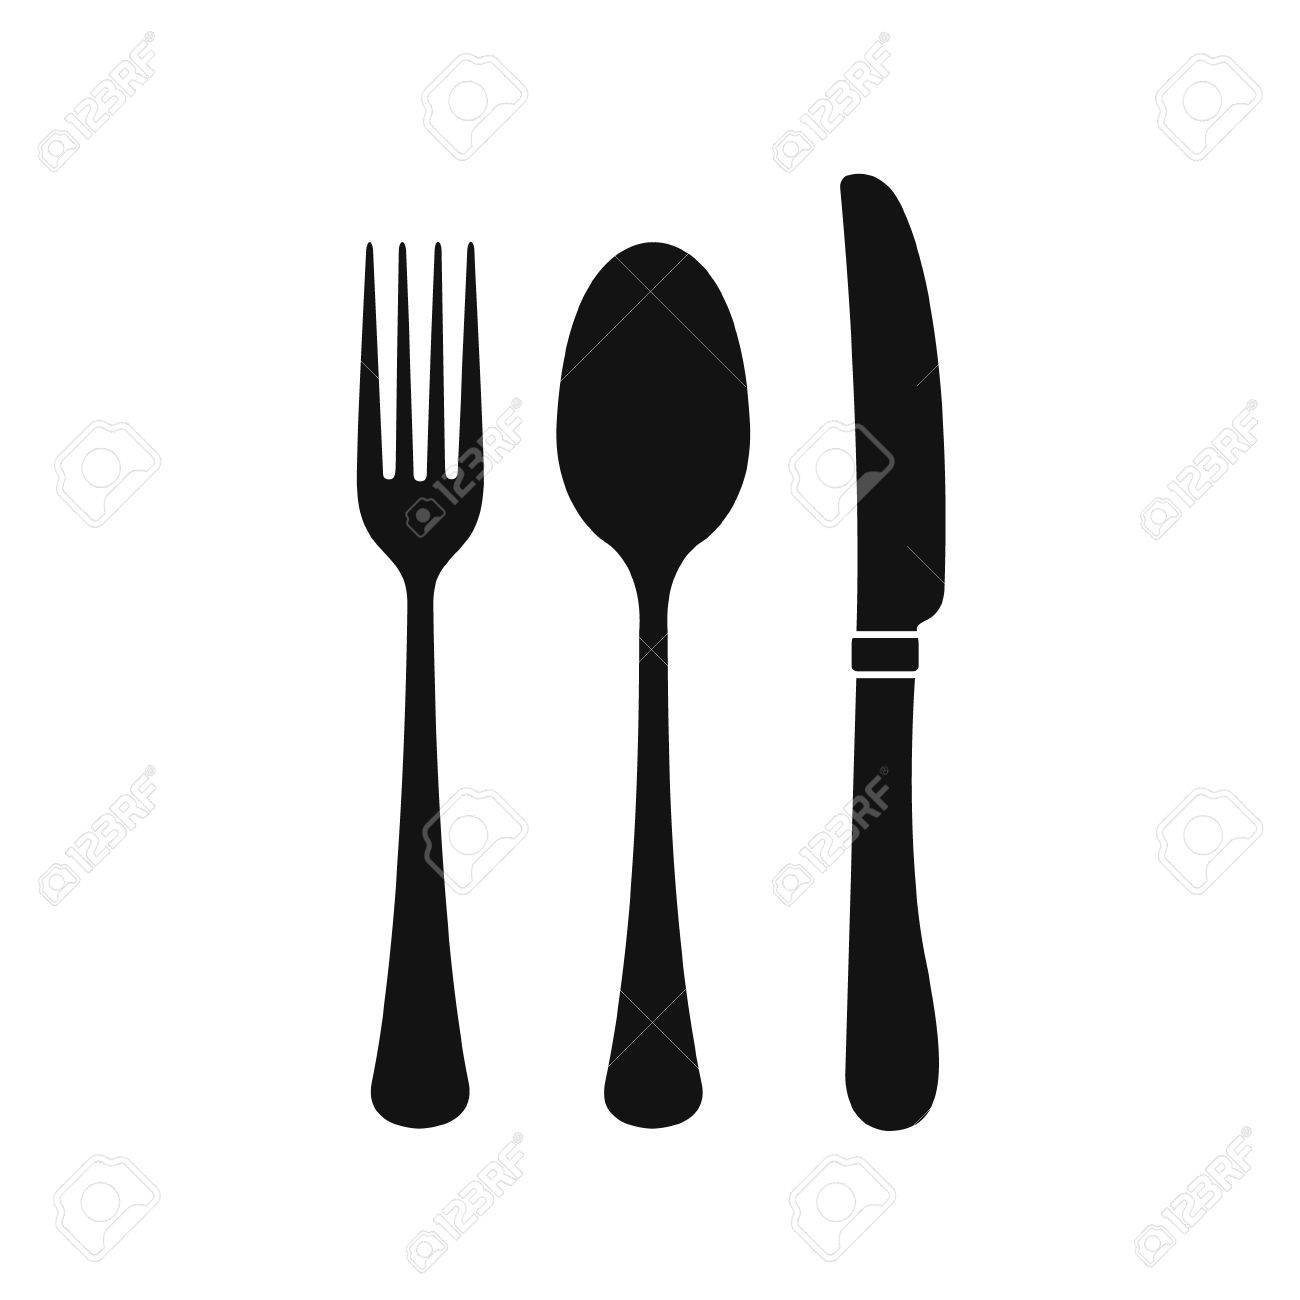 Spoon Fork Knife Silhouette.